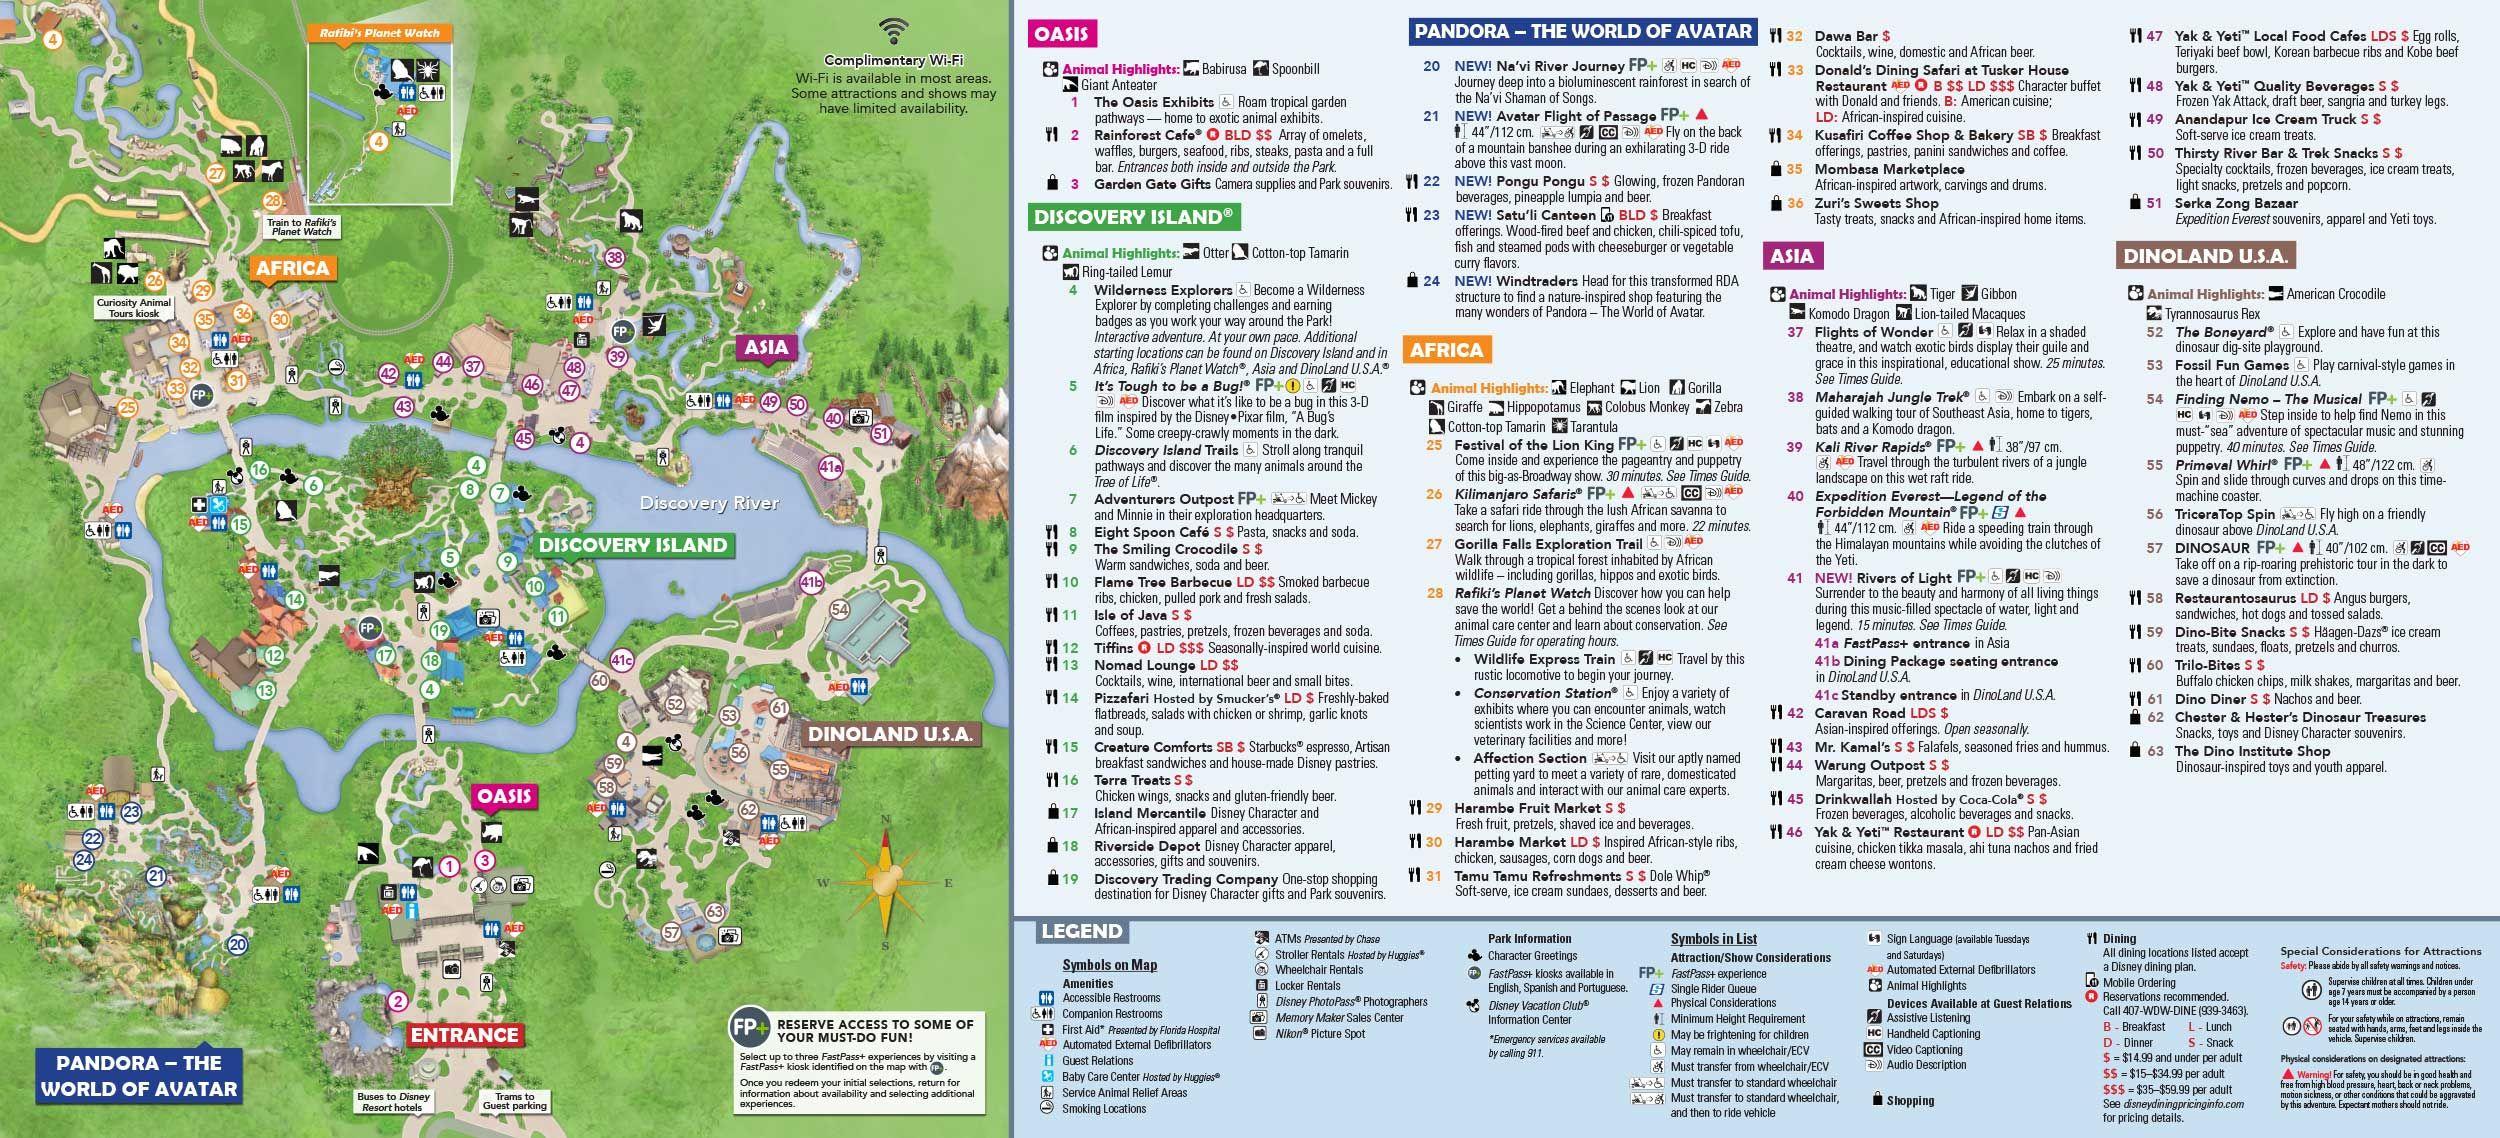 Animal Kingdom Itinerary In 2019   Disney World   Disney World Map - Animal Kingdom Florida Map